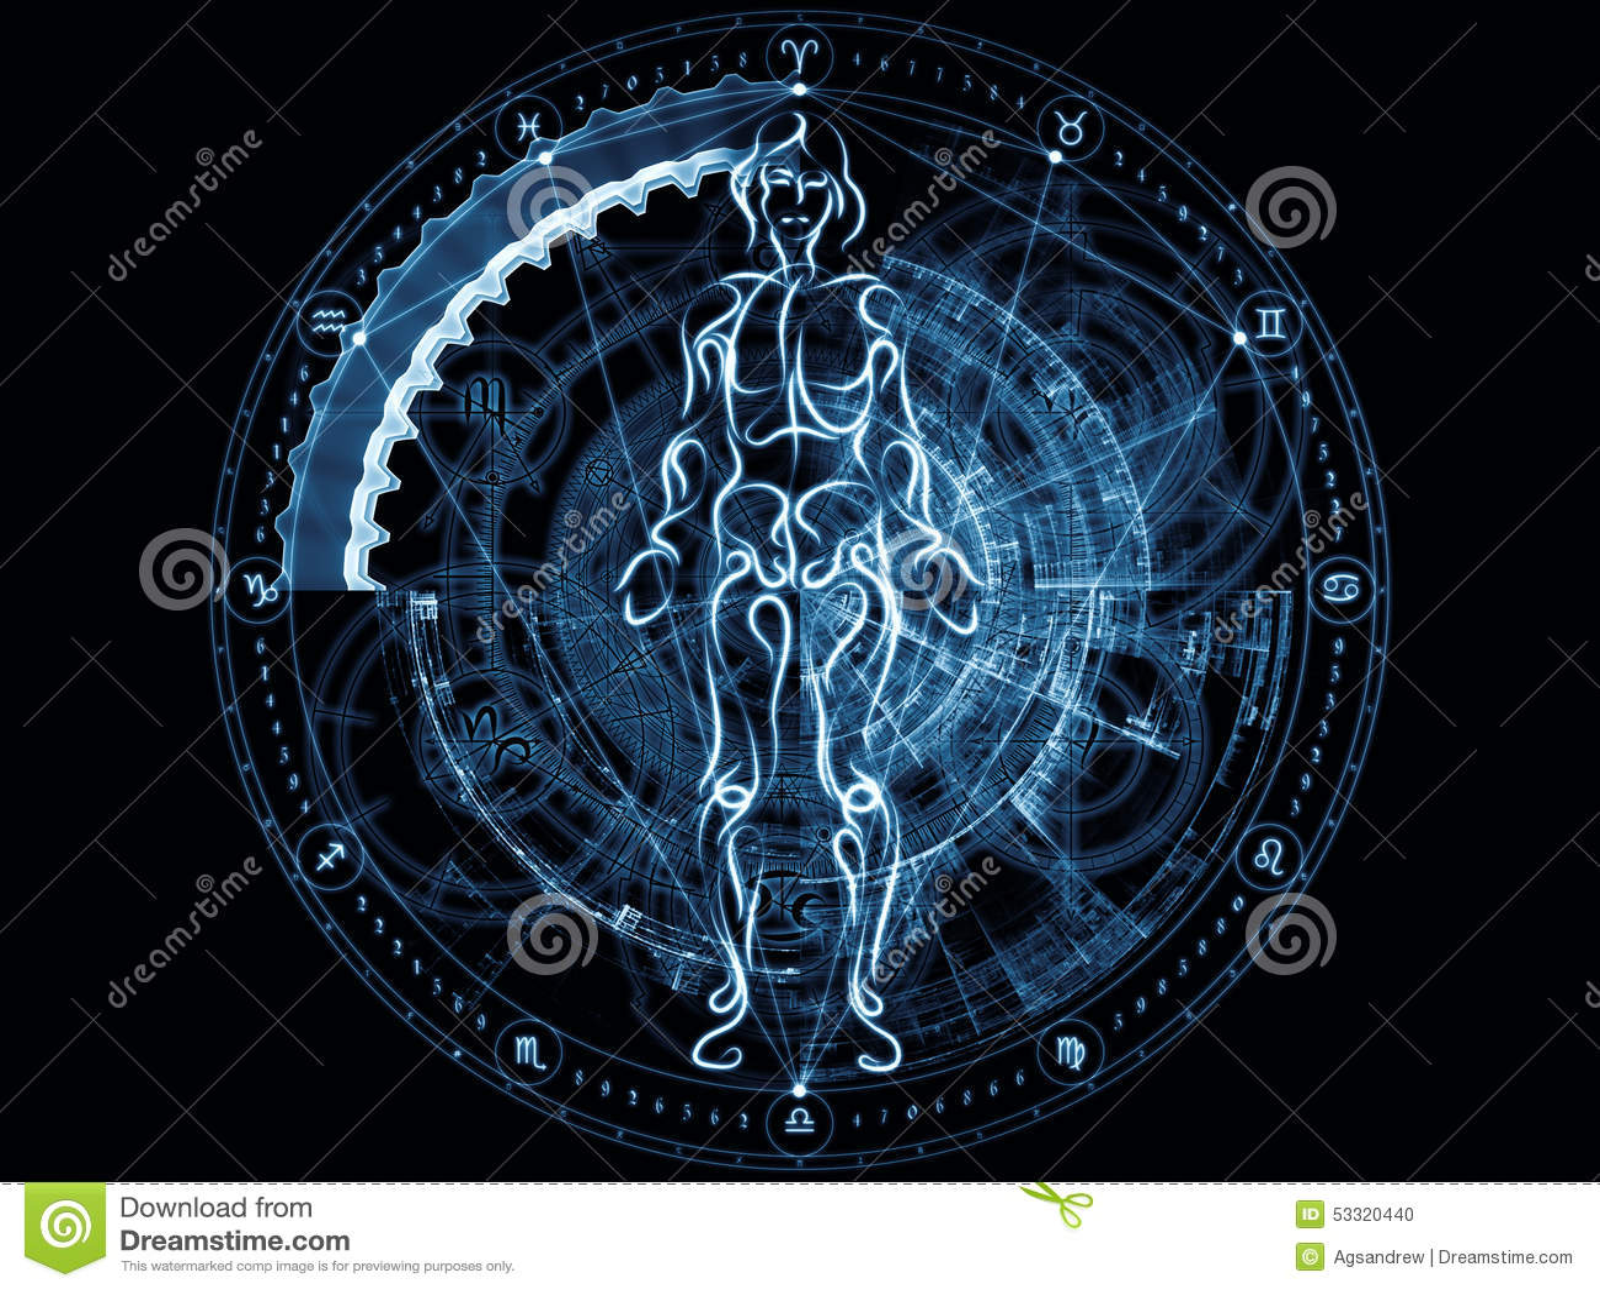 Horoscope Hd Wallpapers Energia Da Geometria Sagrado Foto De Stock Imagem De